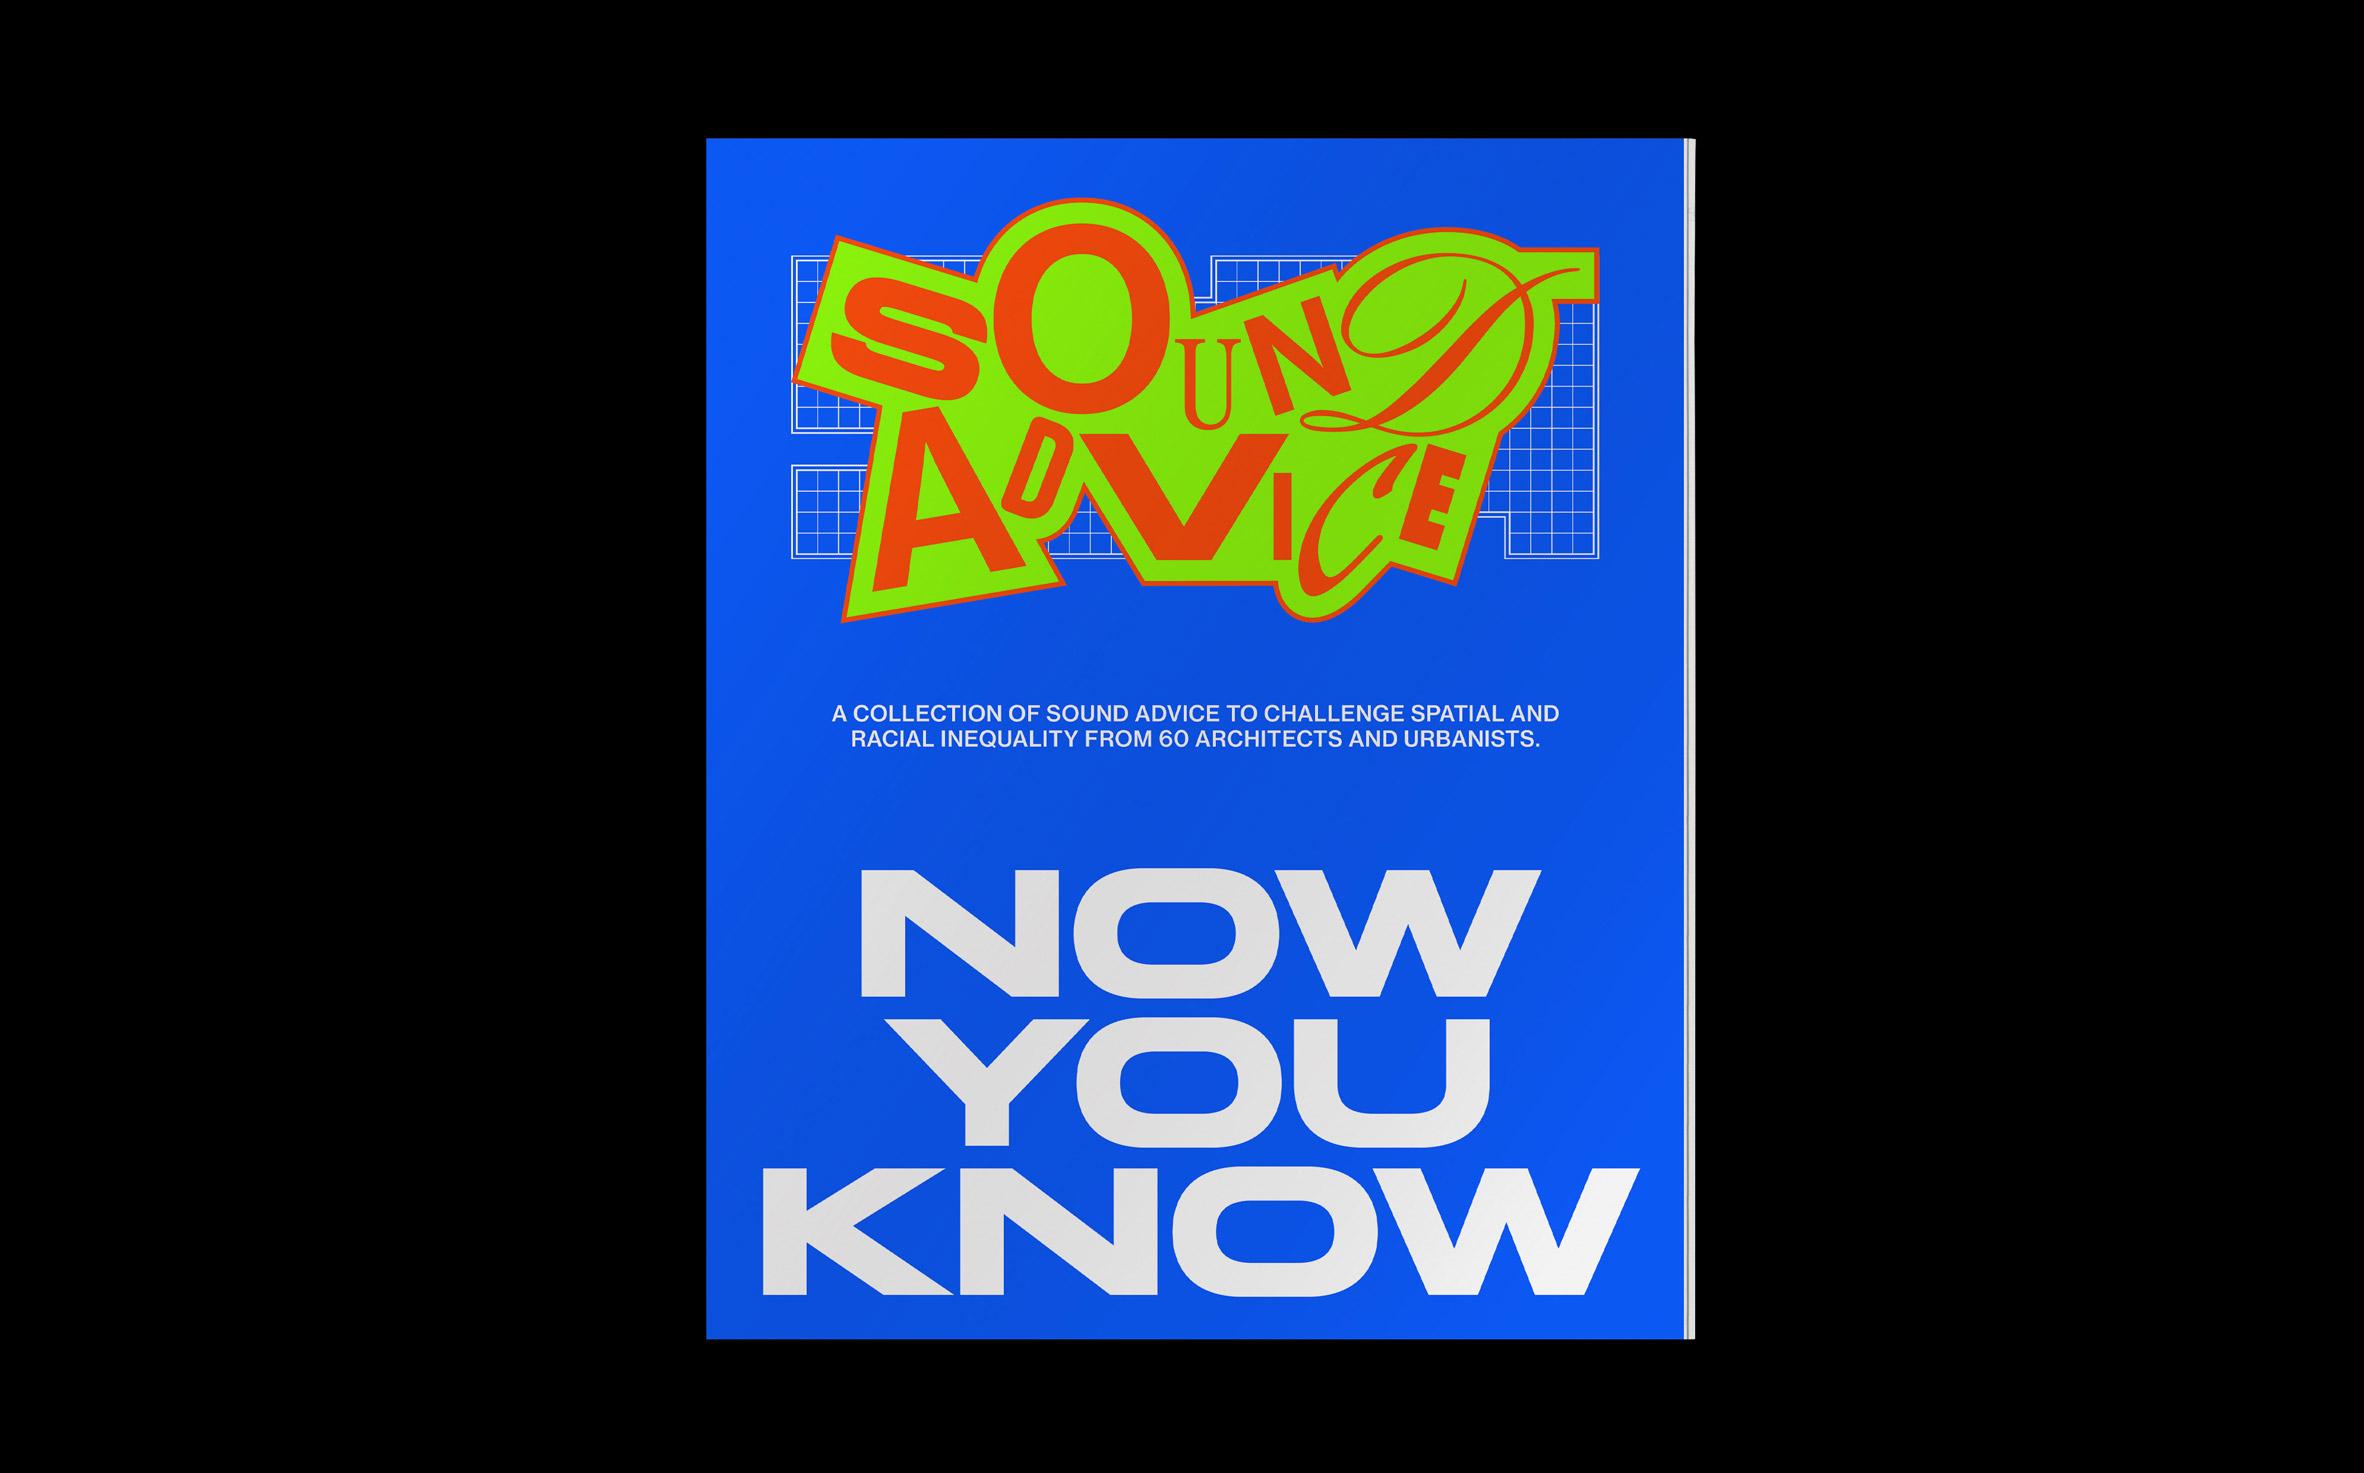 Sound Advice Now You Know publication